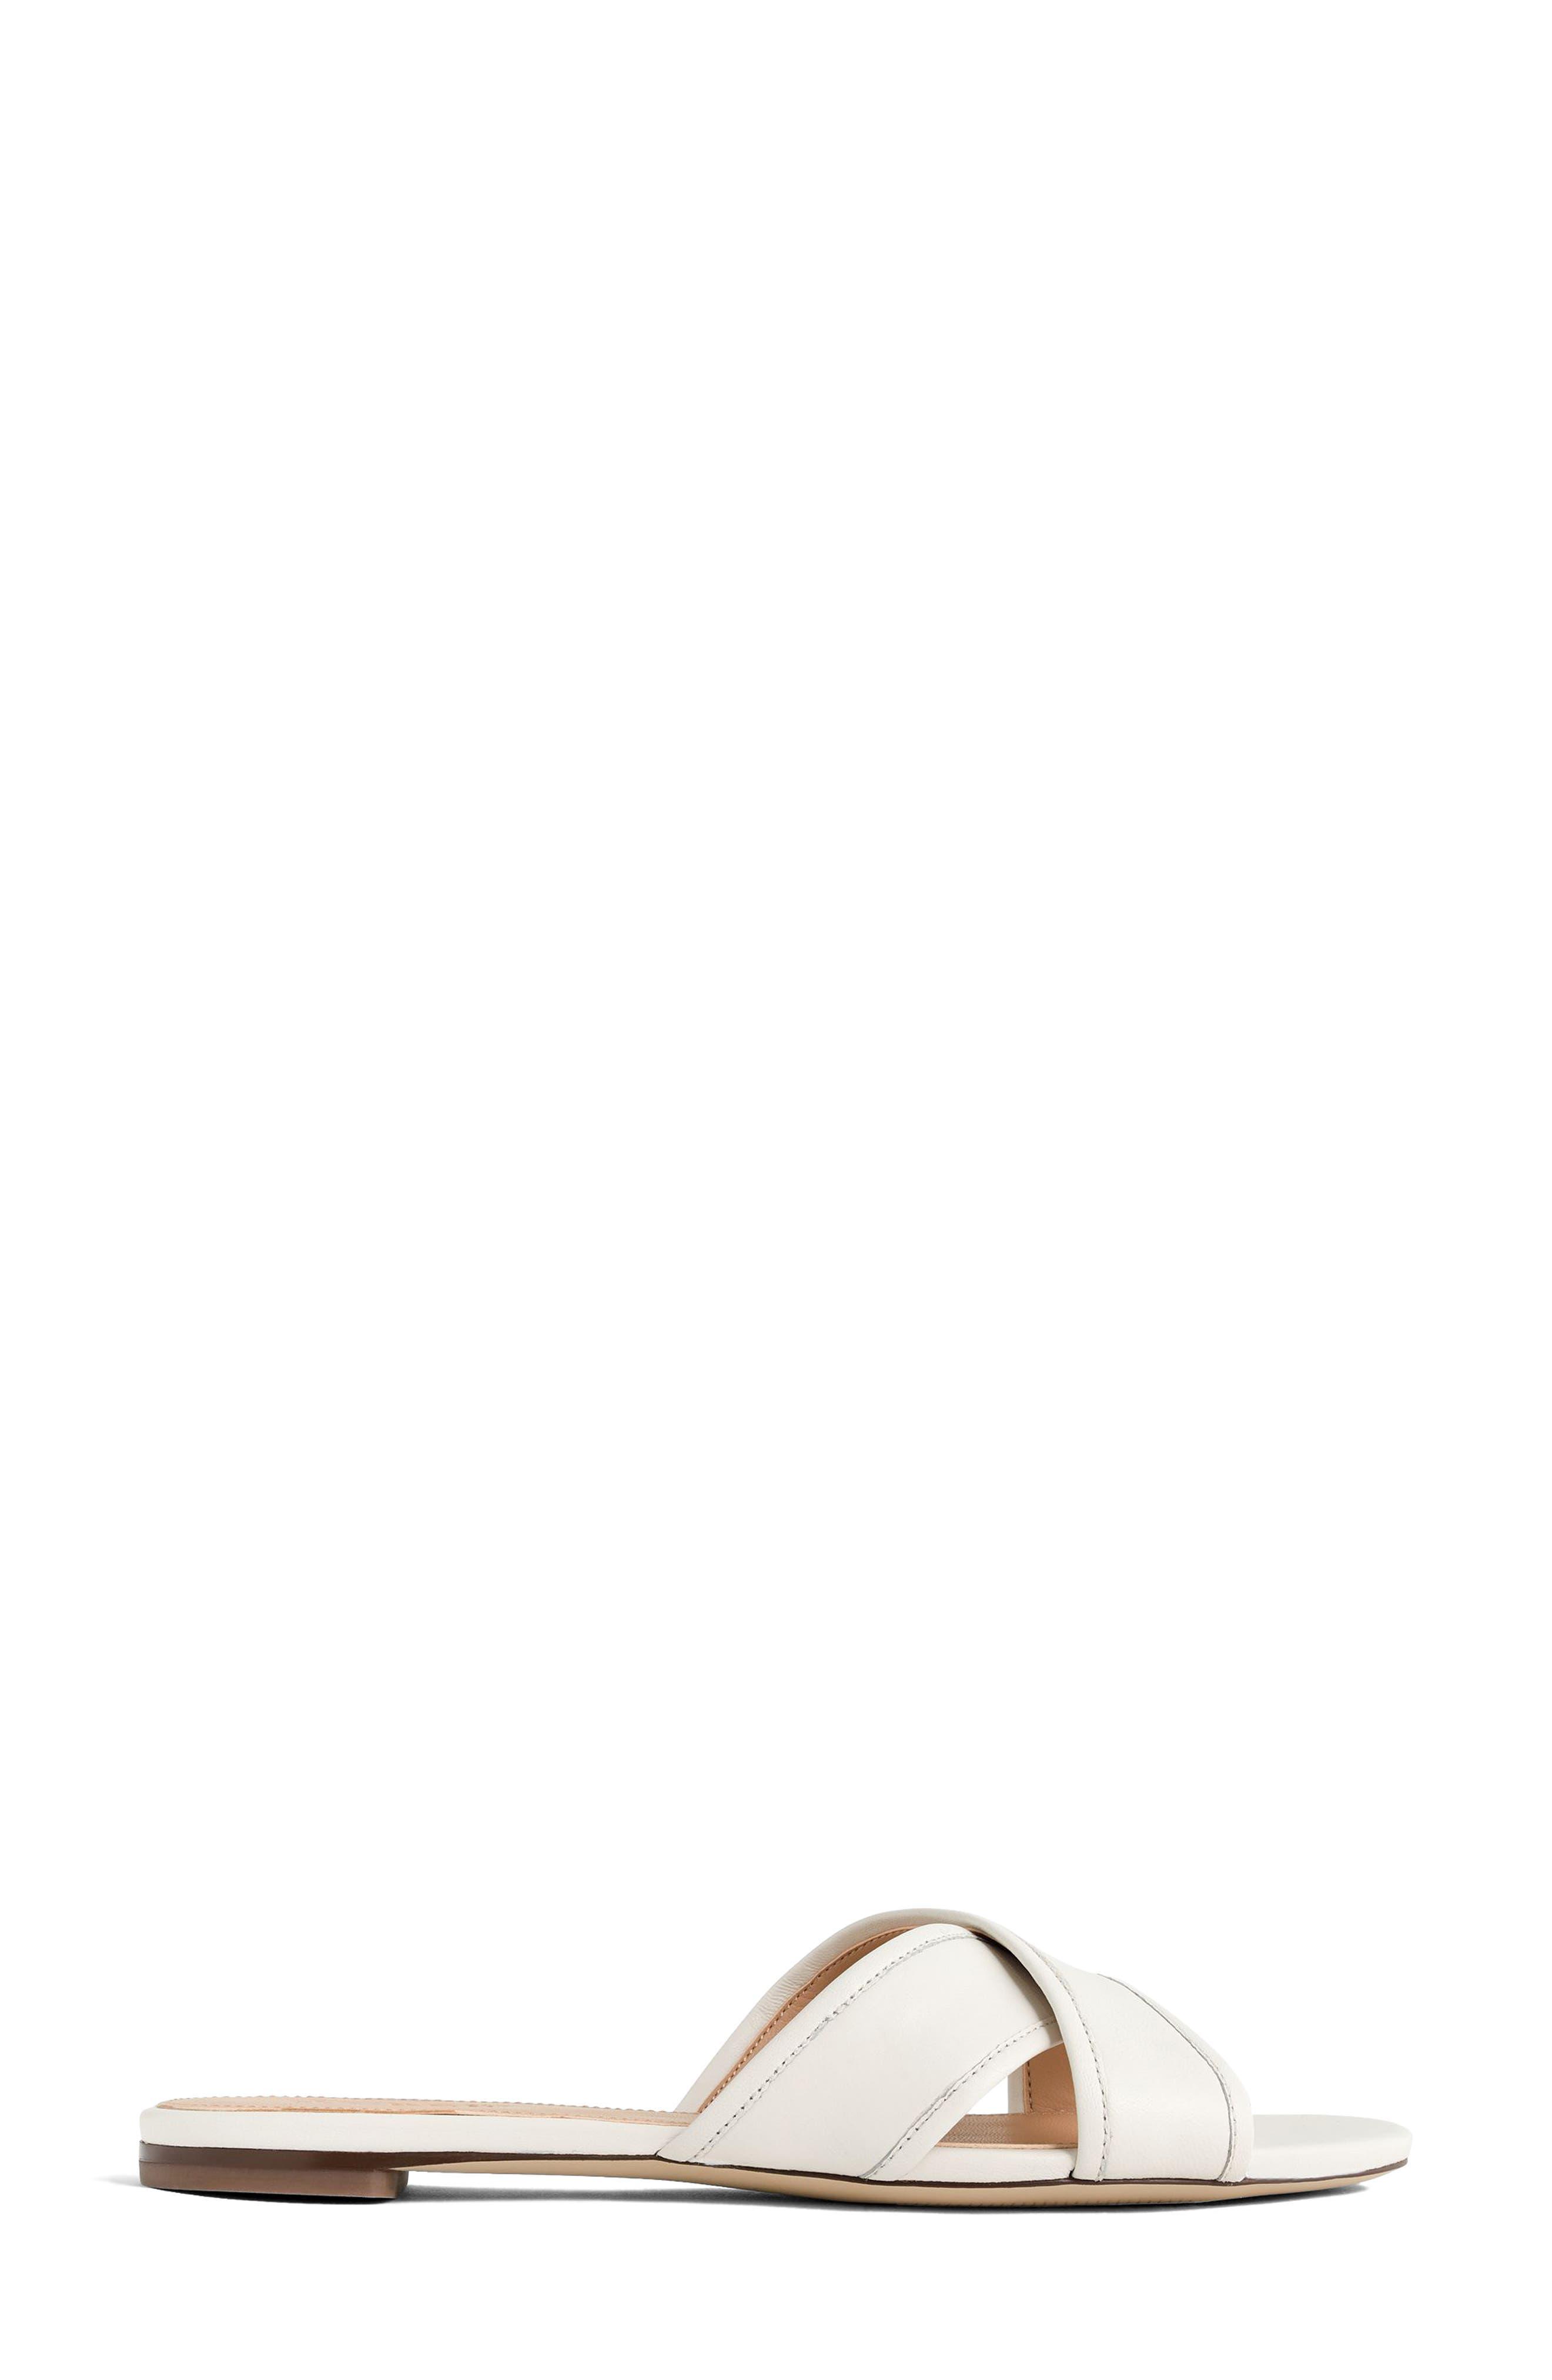 Cora Slide Sandal,                             Alternate thumbnail 2, color,                             Vintage Champagne Leather